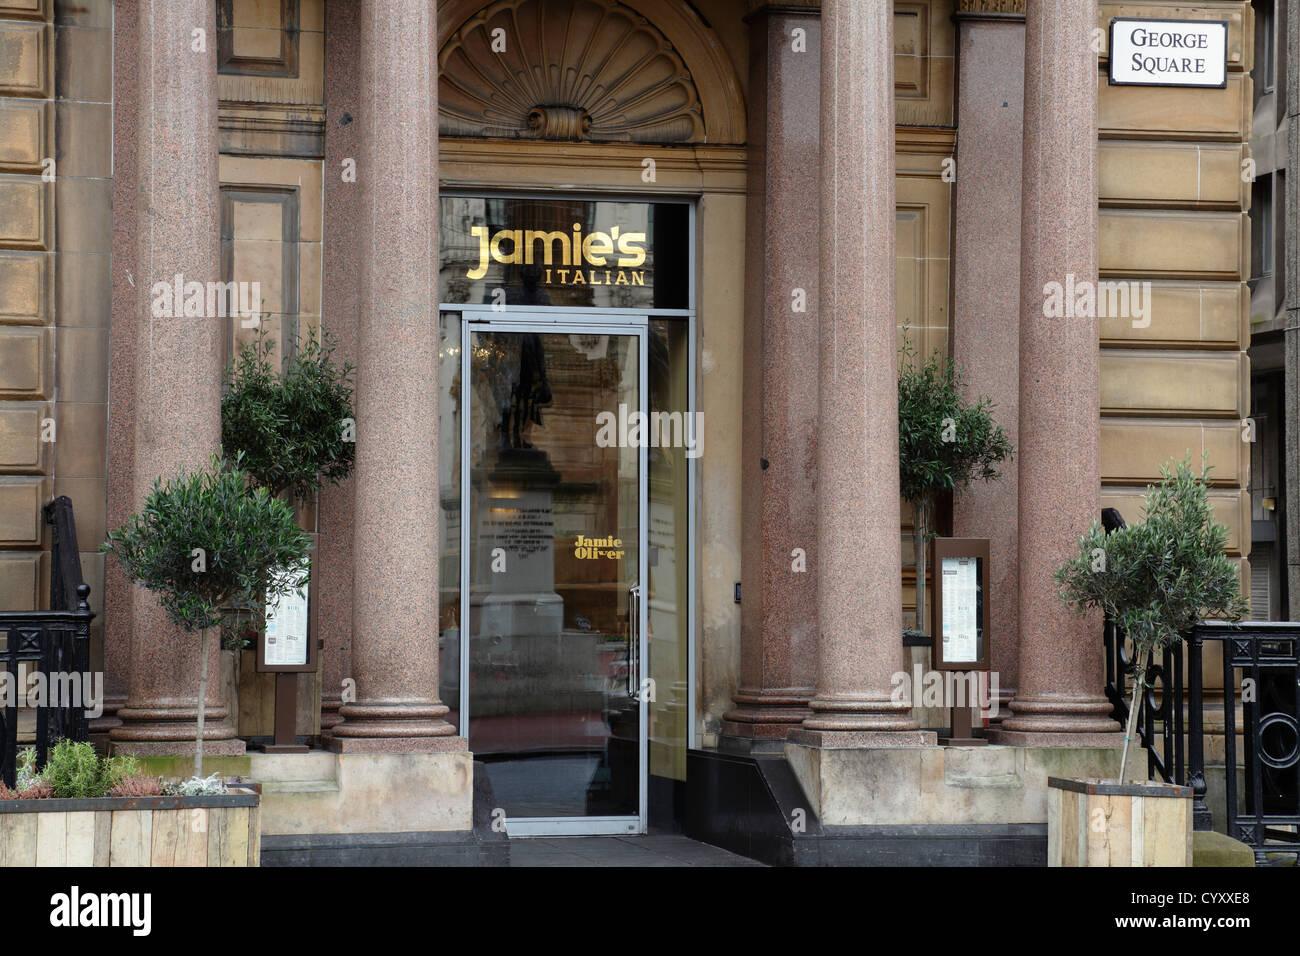 Entrance to Jamie Oliver's Italian Restaurant in Glasgow city centre, Scotland, UK - Stock Image